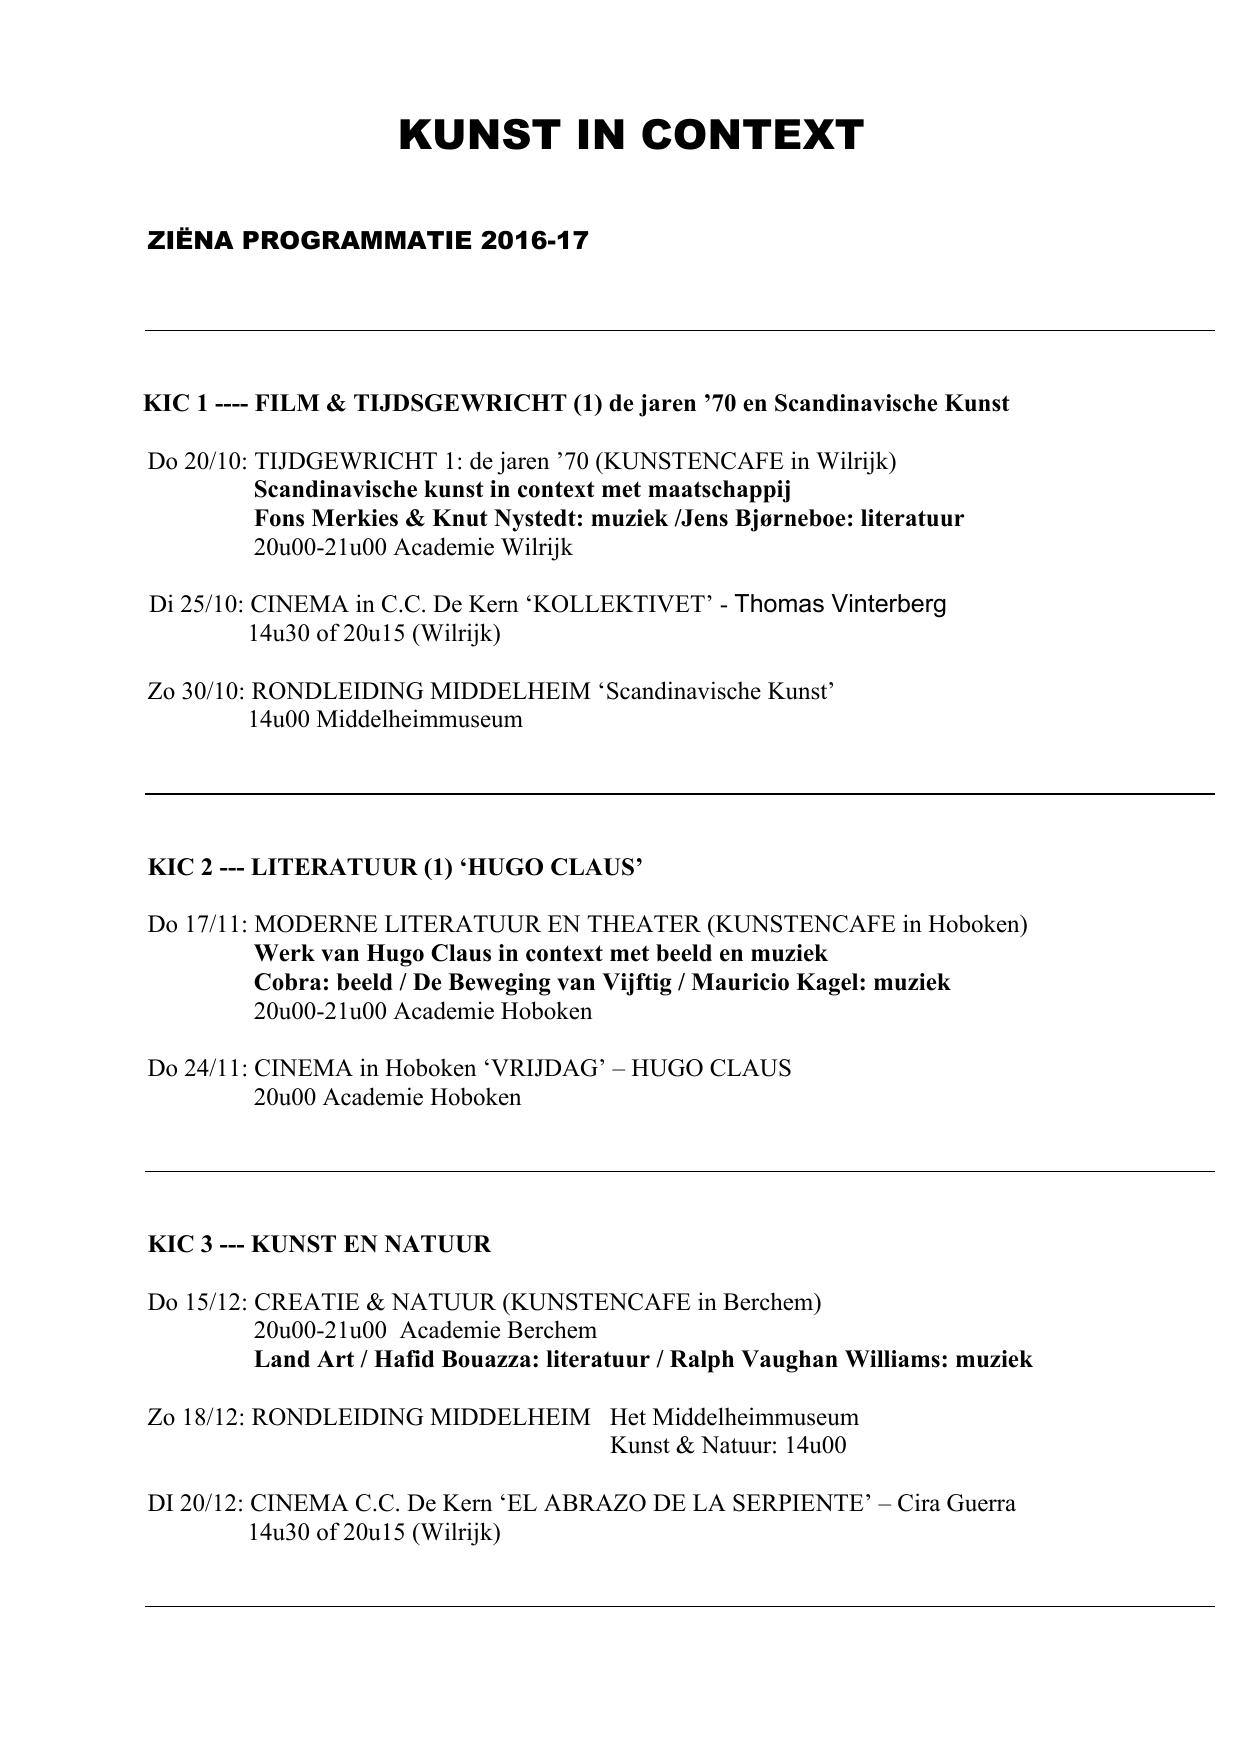 ziëna programmatie 2016-17